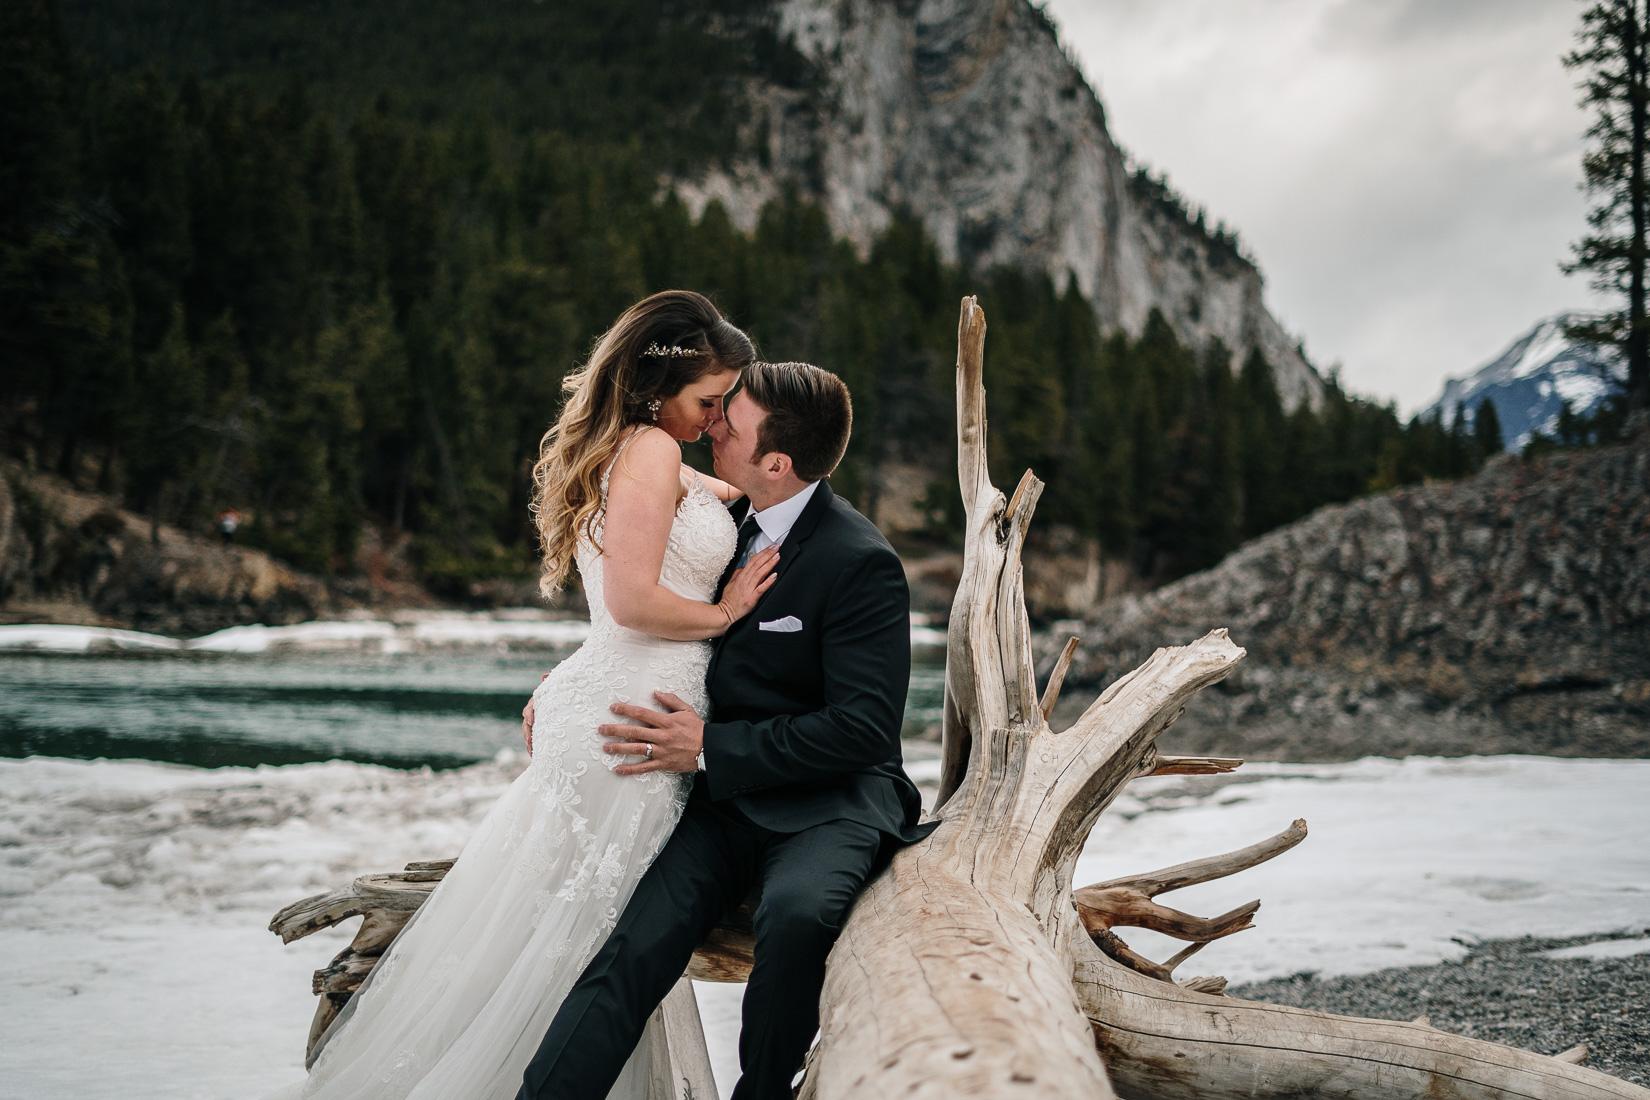 sexy wedding pose near river